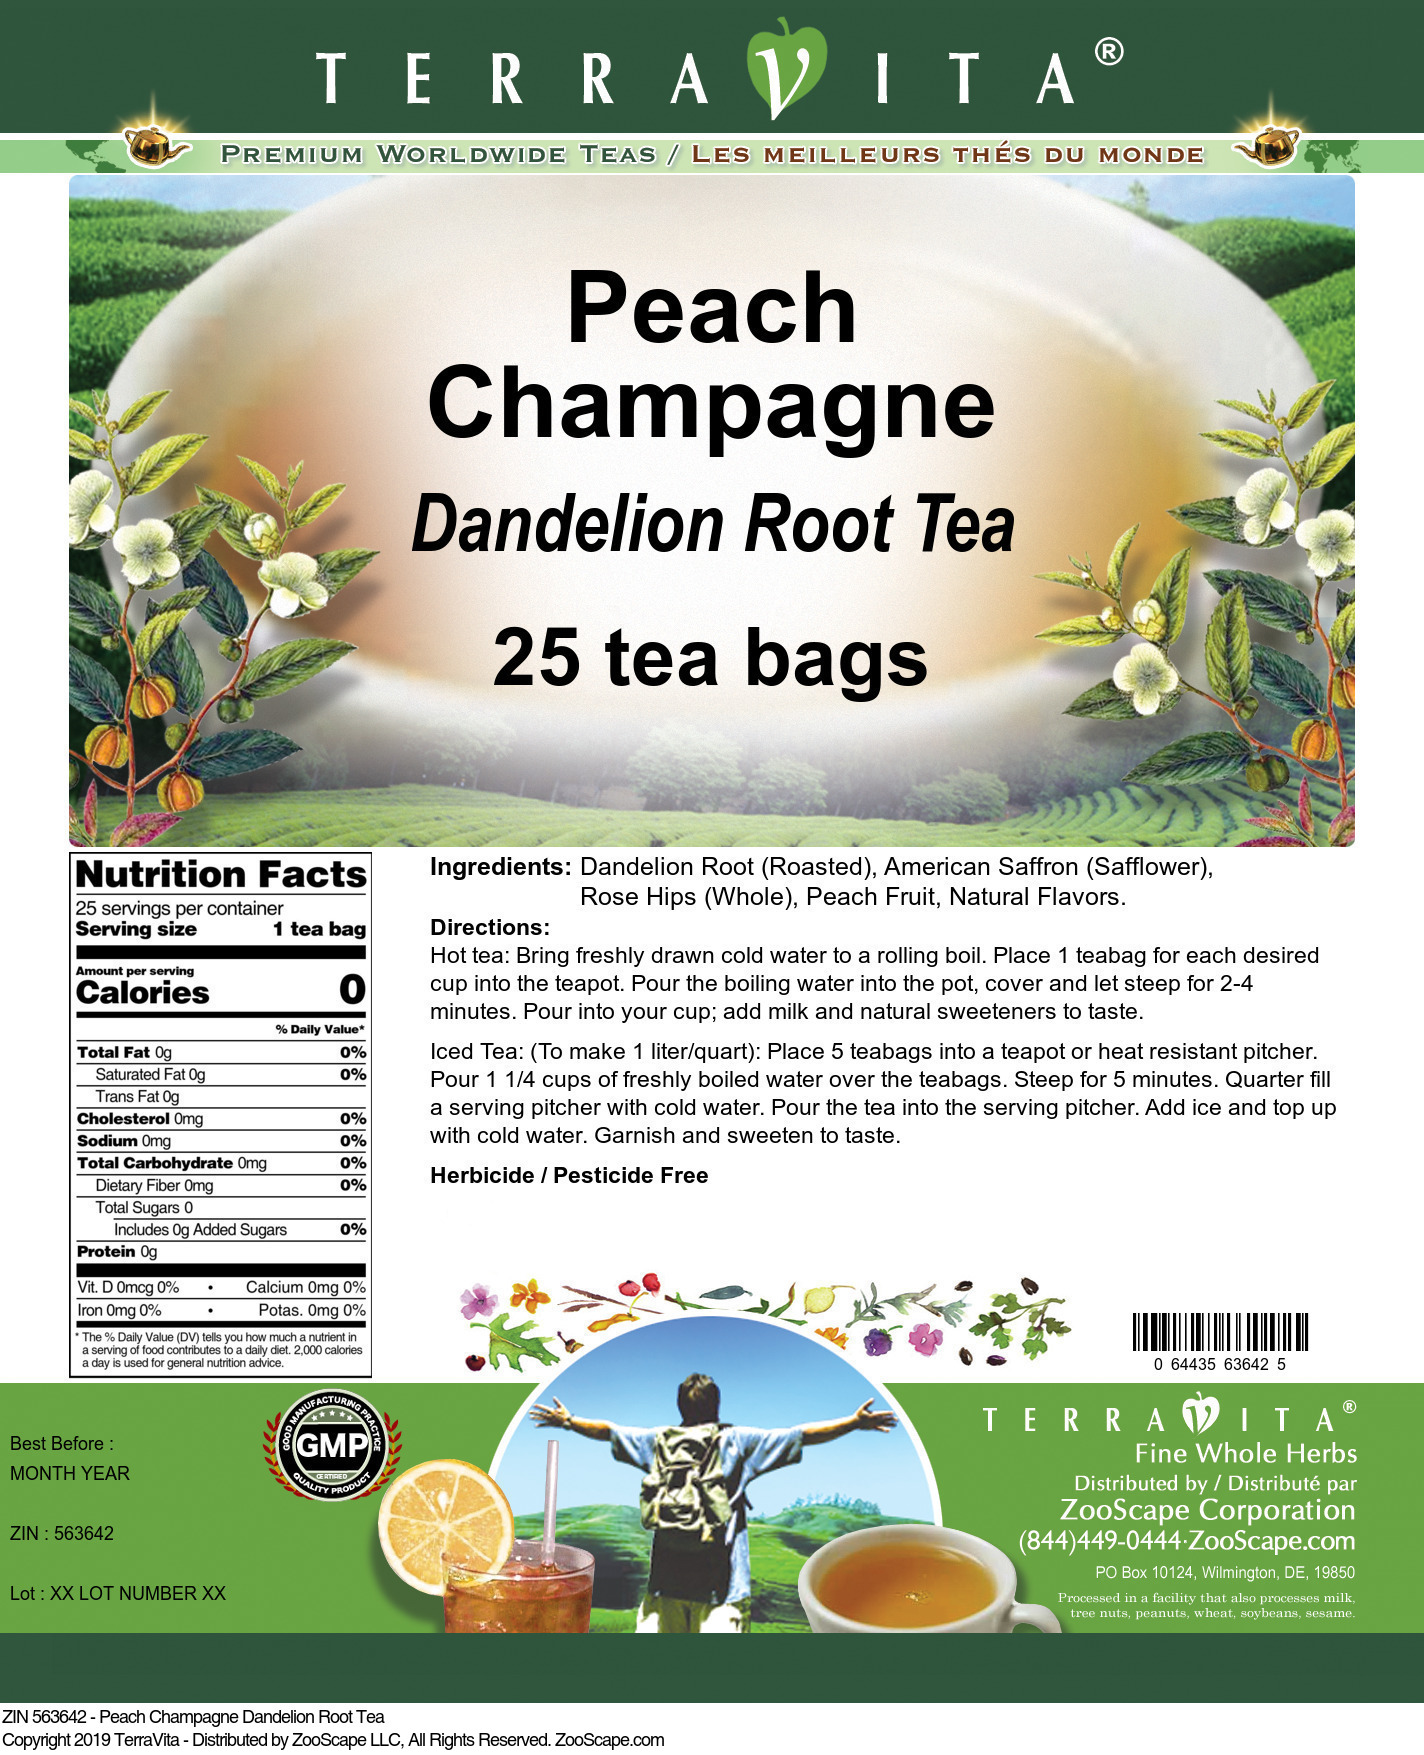 Peach Champagne Dandelion Root